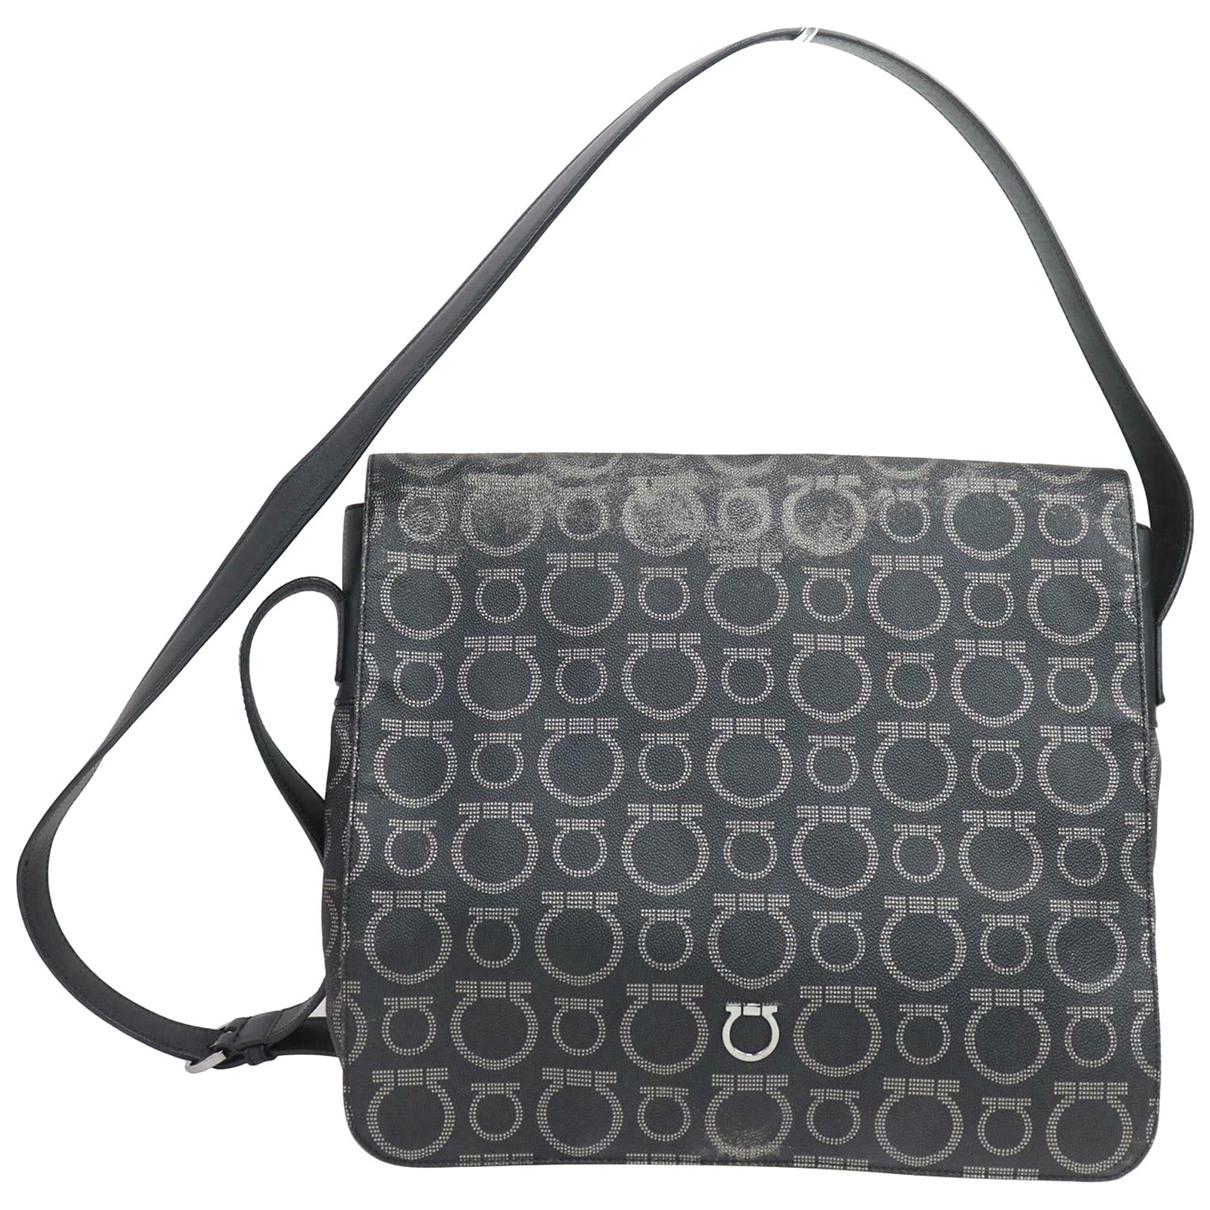 Salvatore Ferragamo \N Black handbag for Women \N